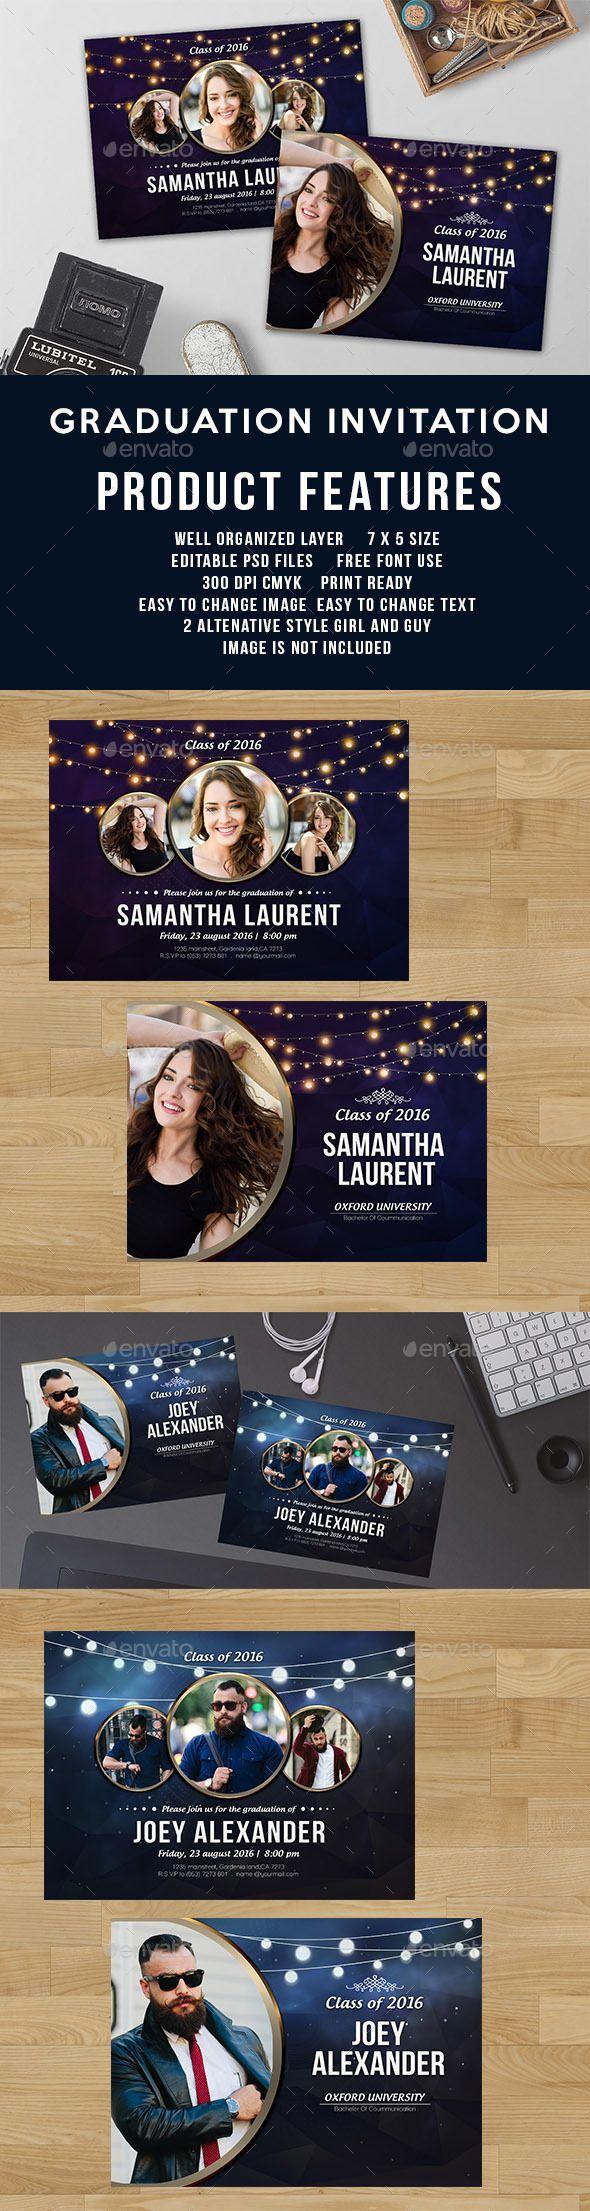 Graduation Invitation Card Template PSD